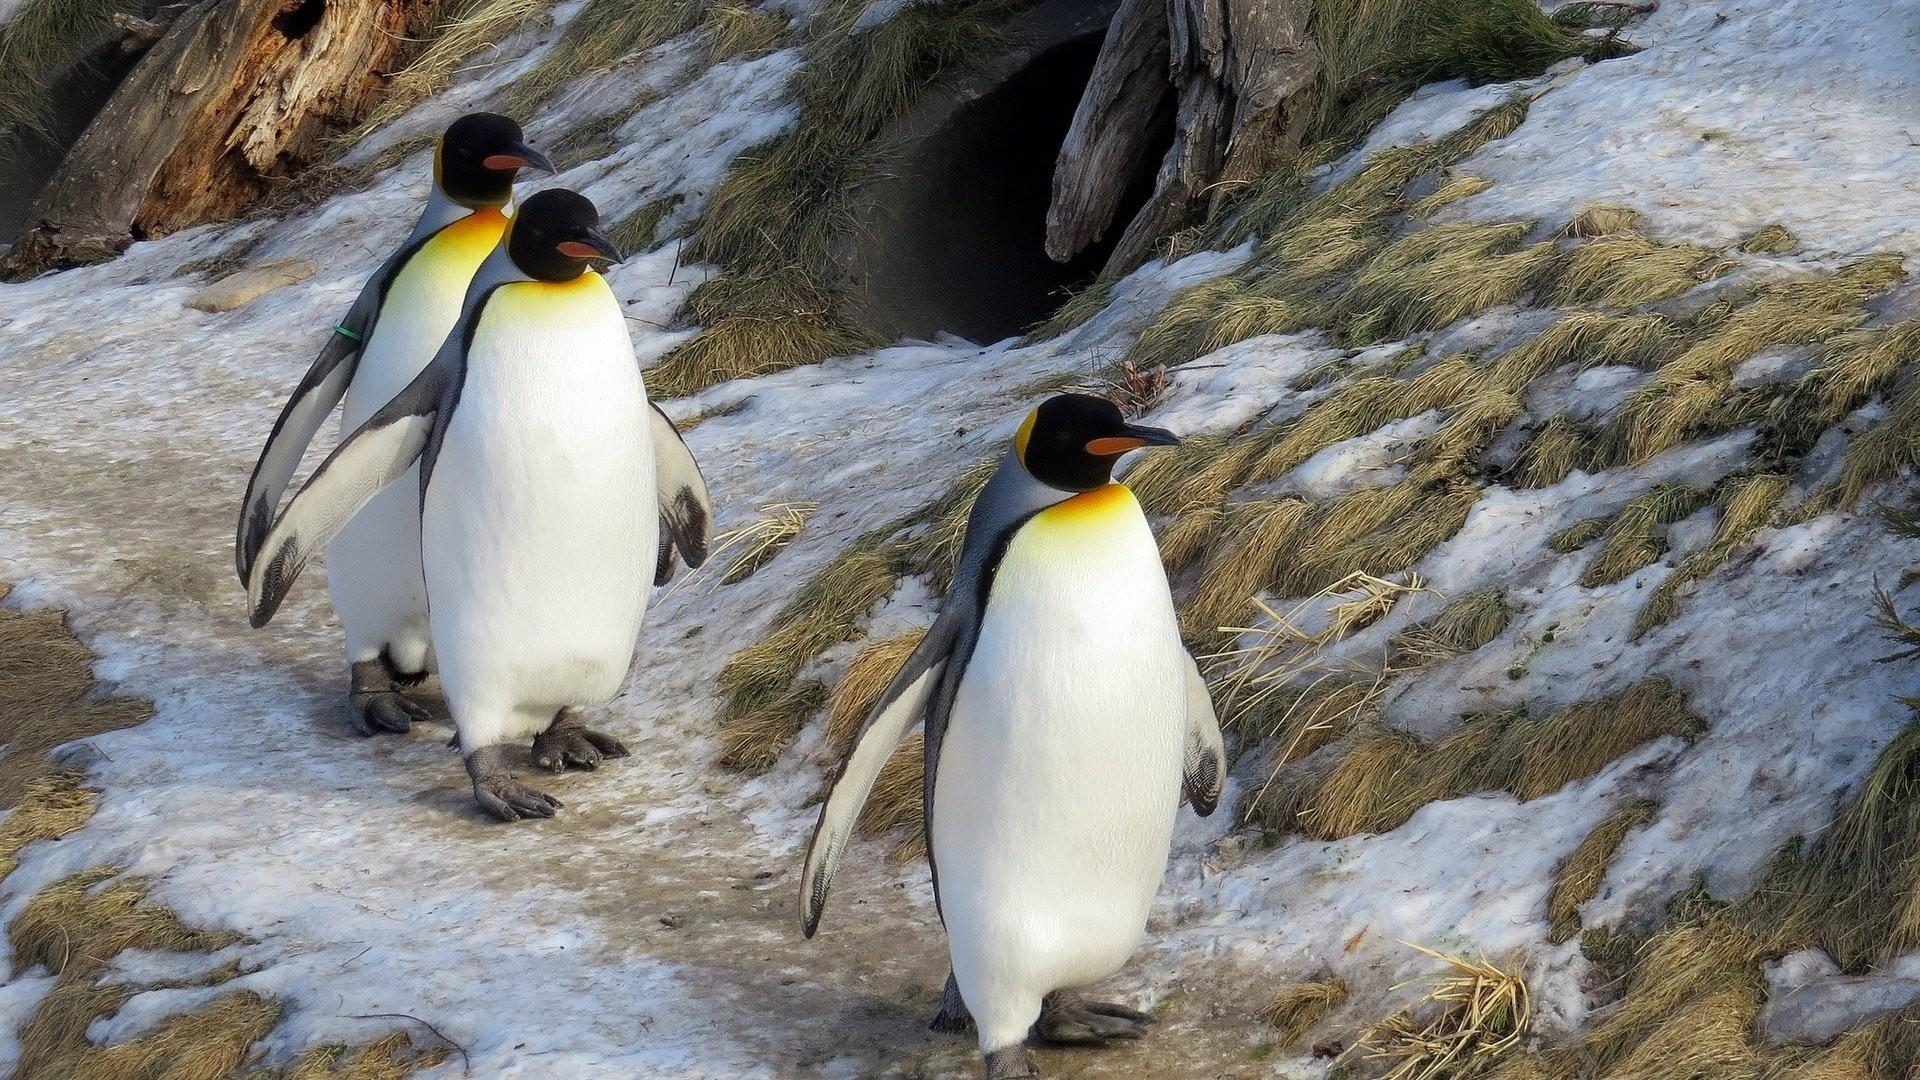 Penguin Wallpaper image hd